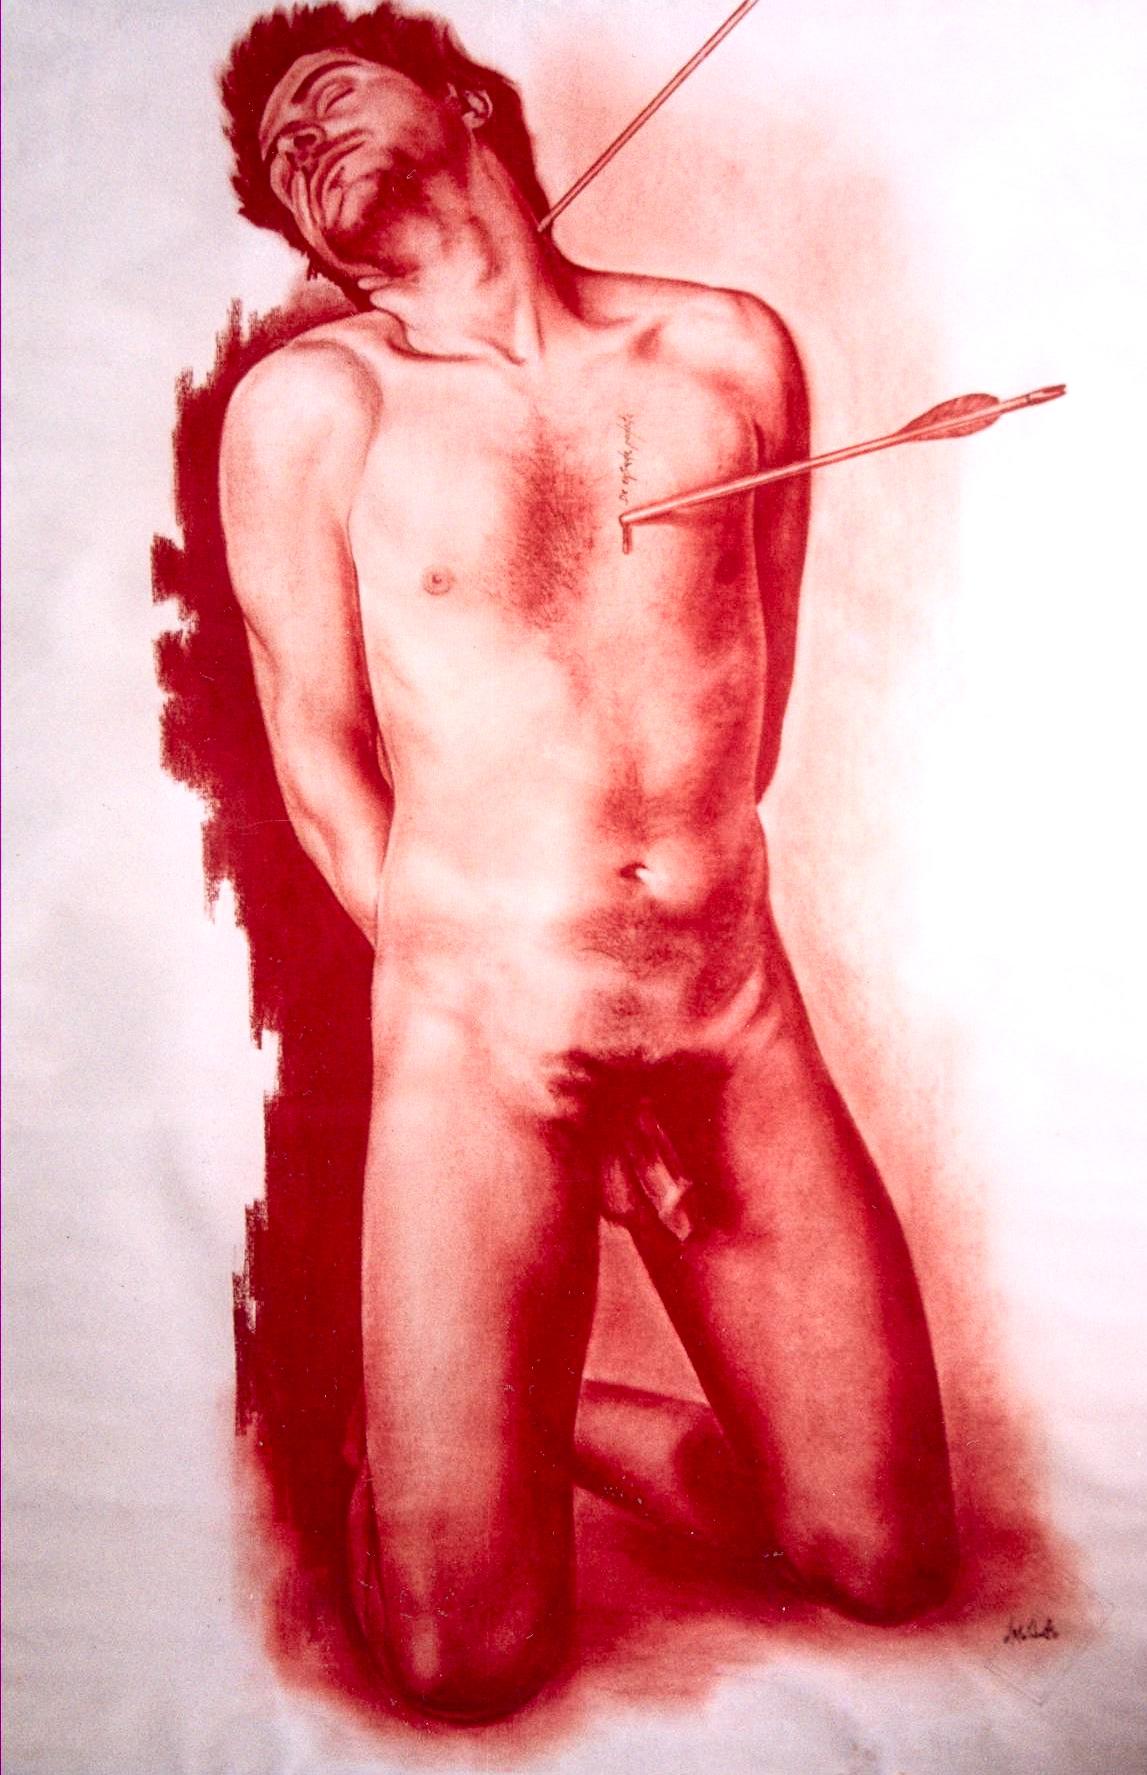 Estudio de anatomía, sanguina sobre papel.